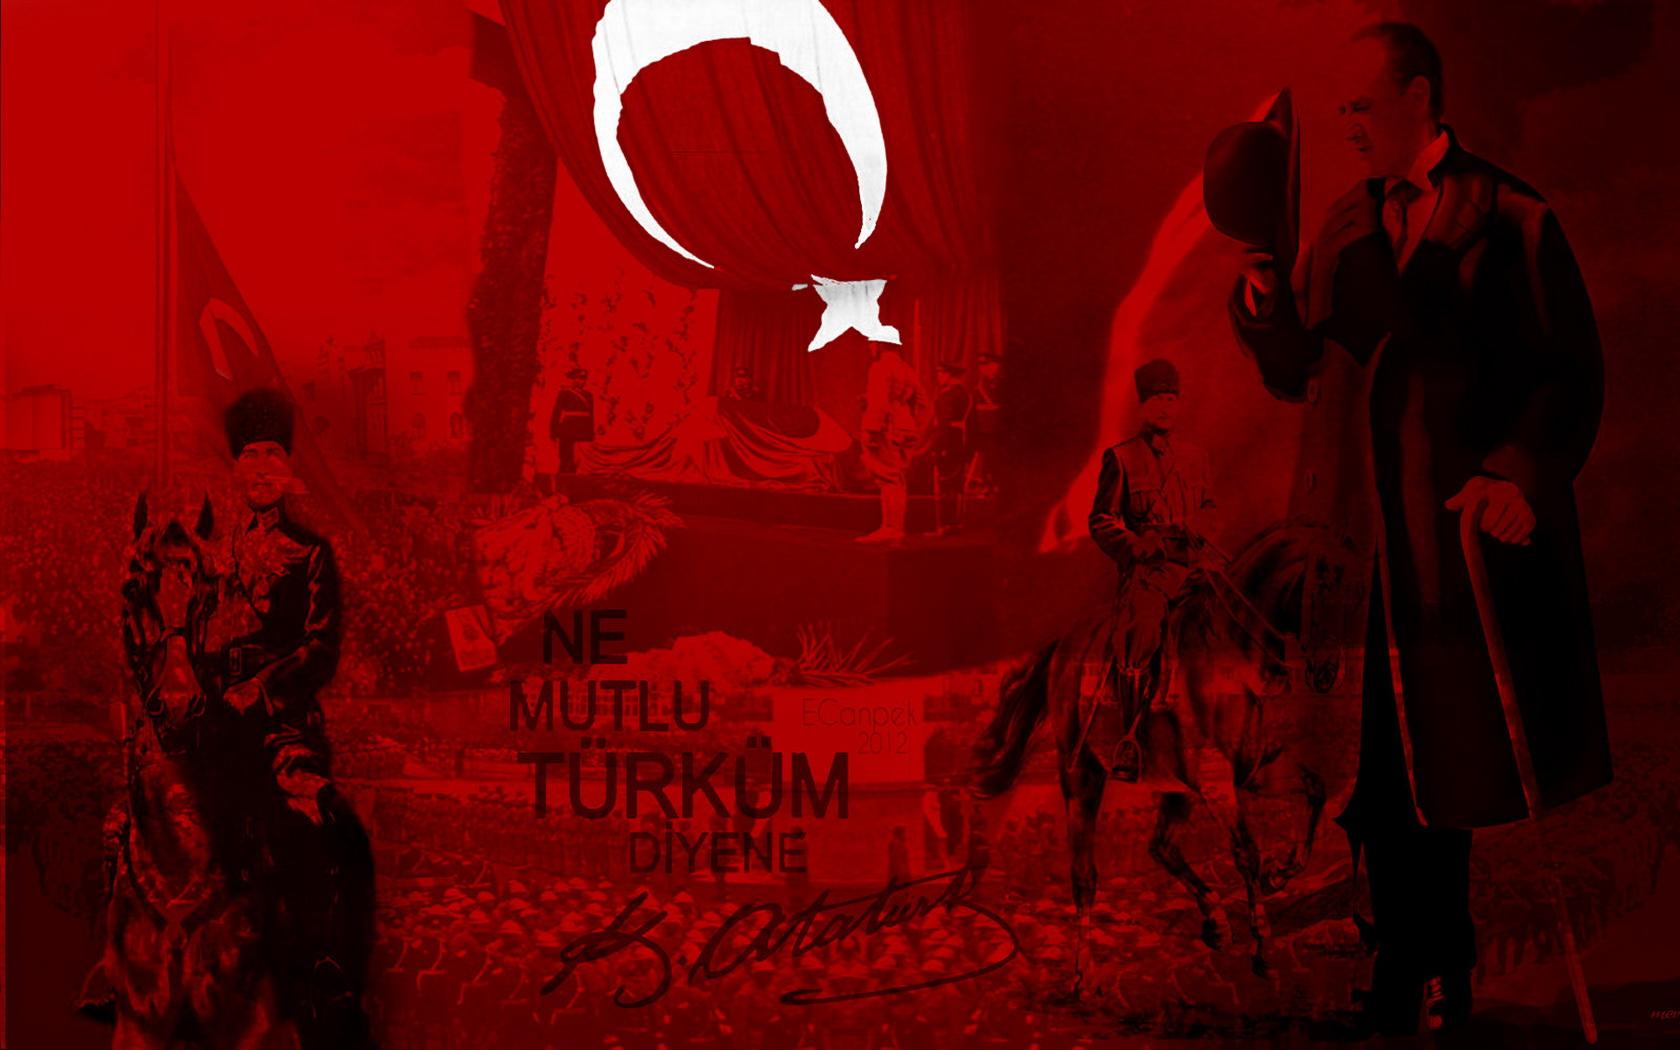 Turk turkish istanbul caps sexsohbet - 1 1